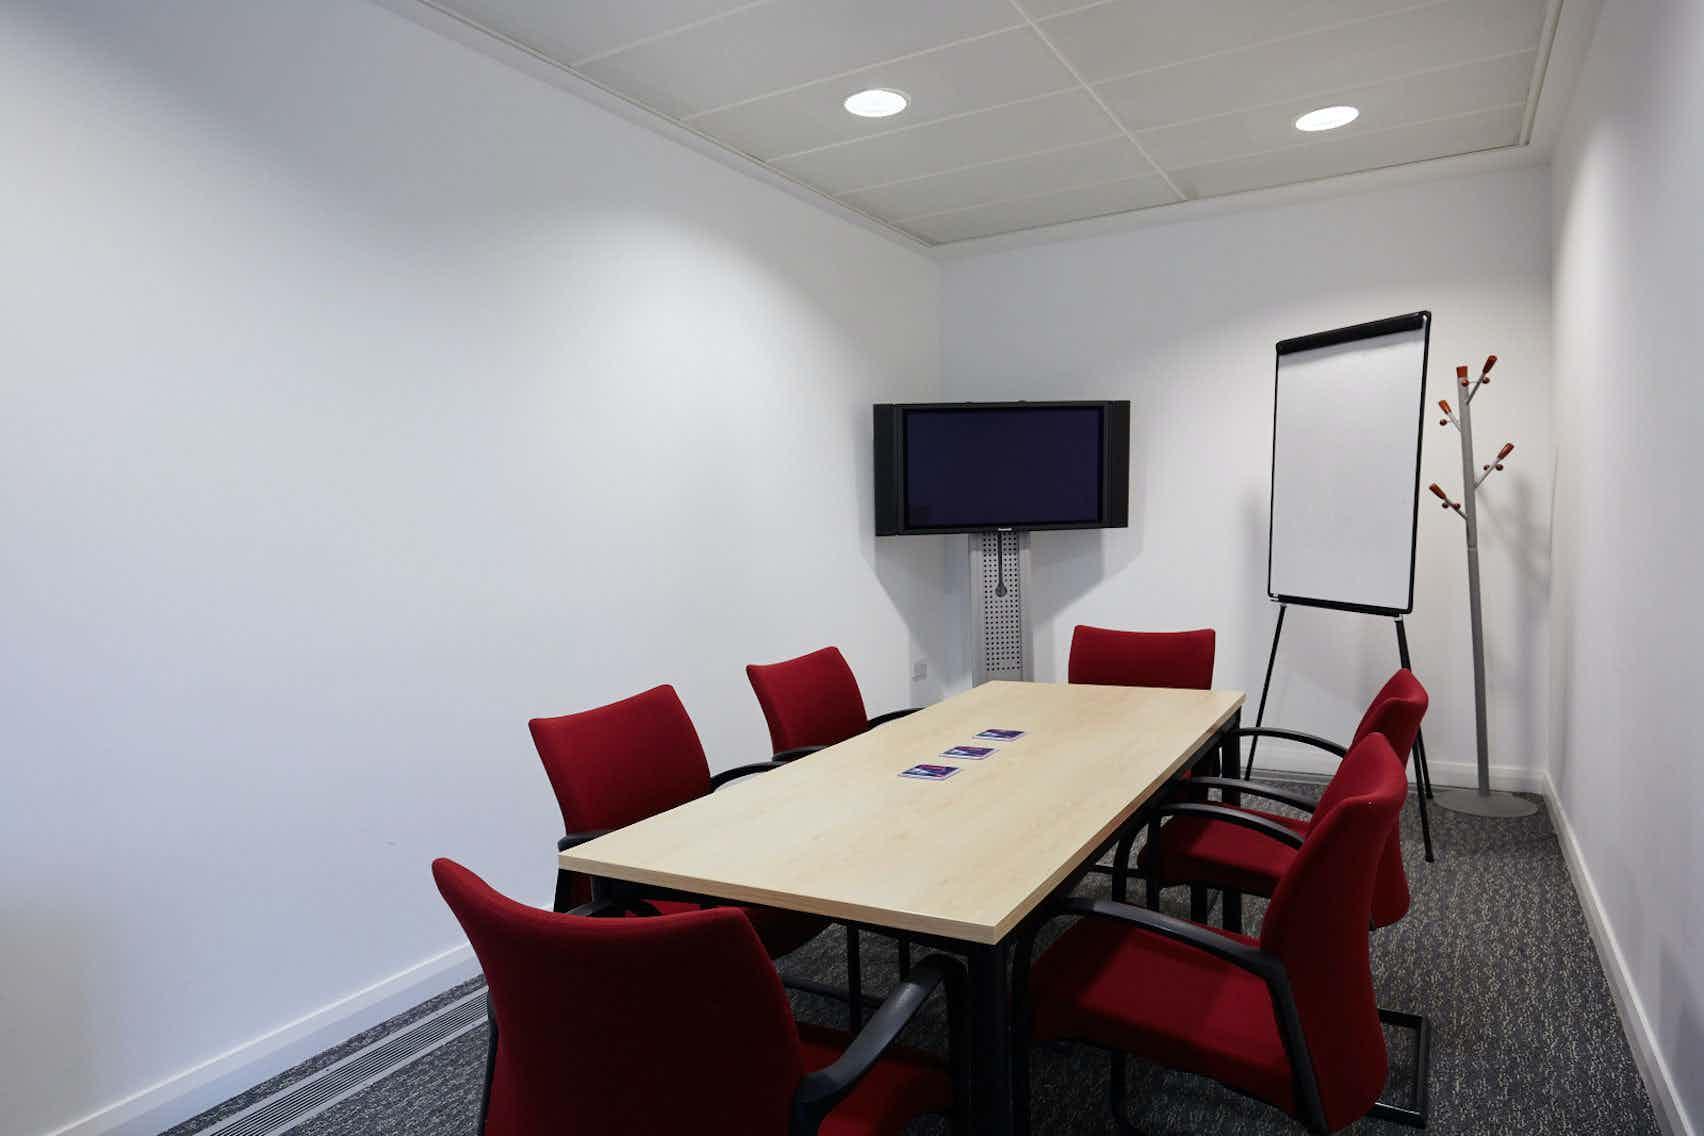 Meeting Room 1, Salford Innovation Forum